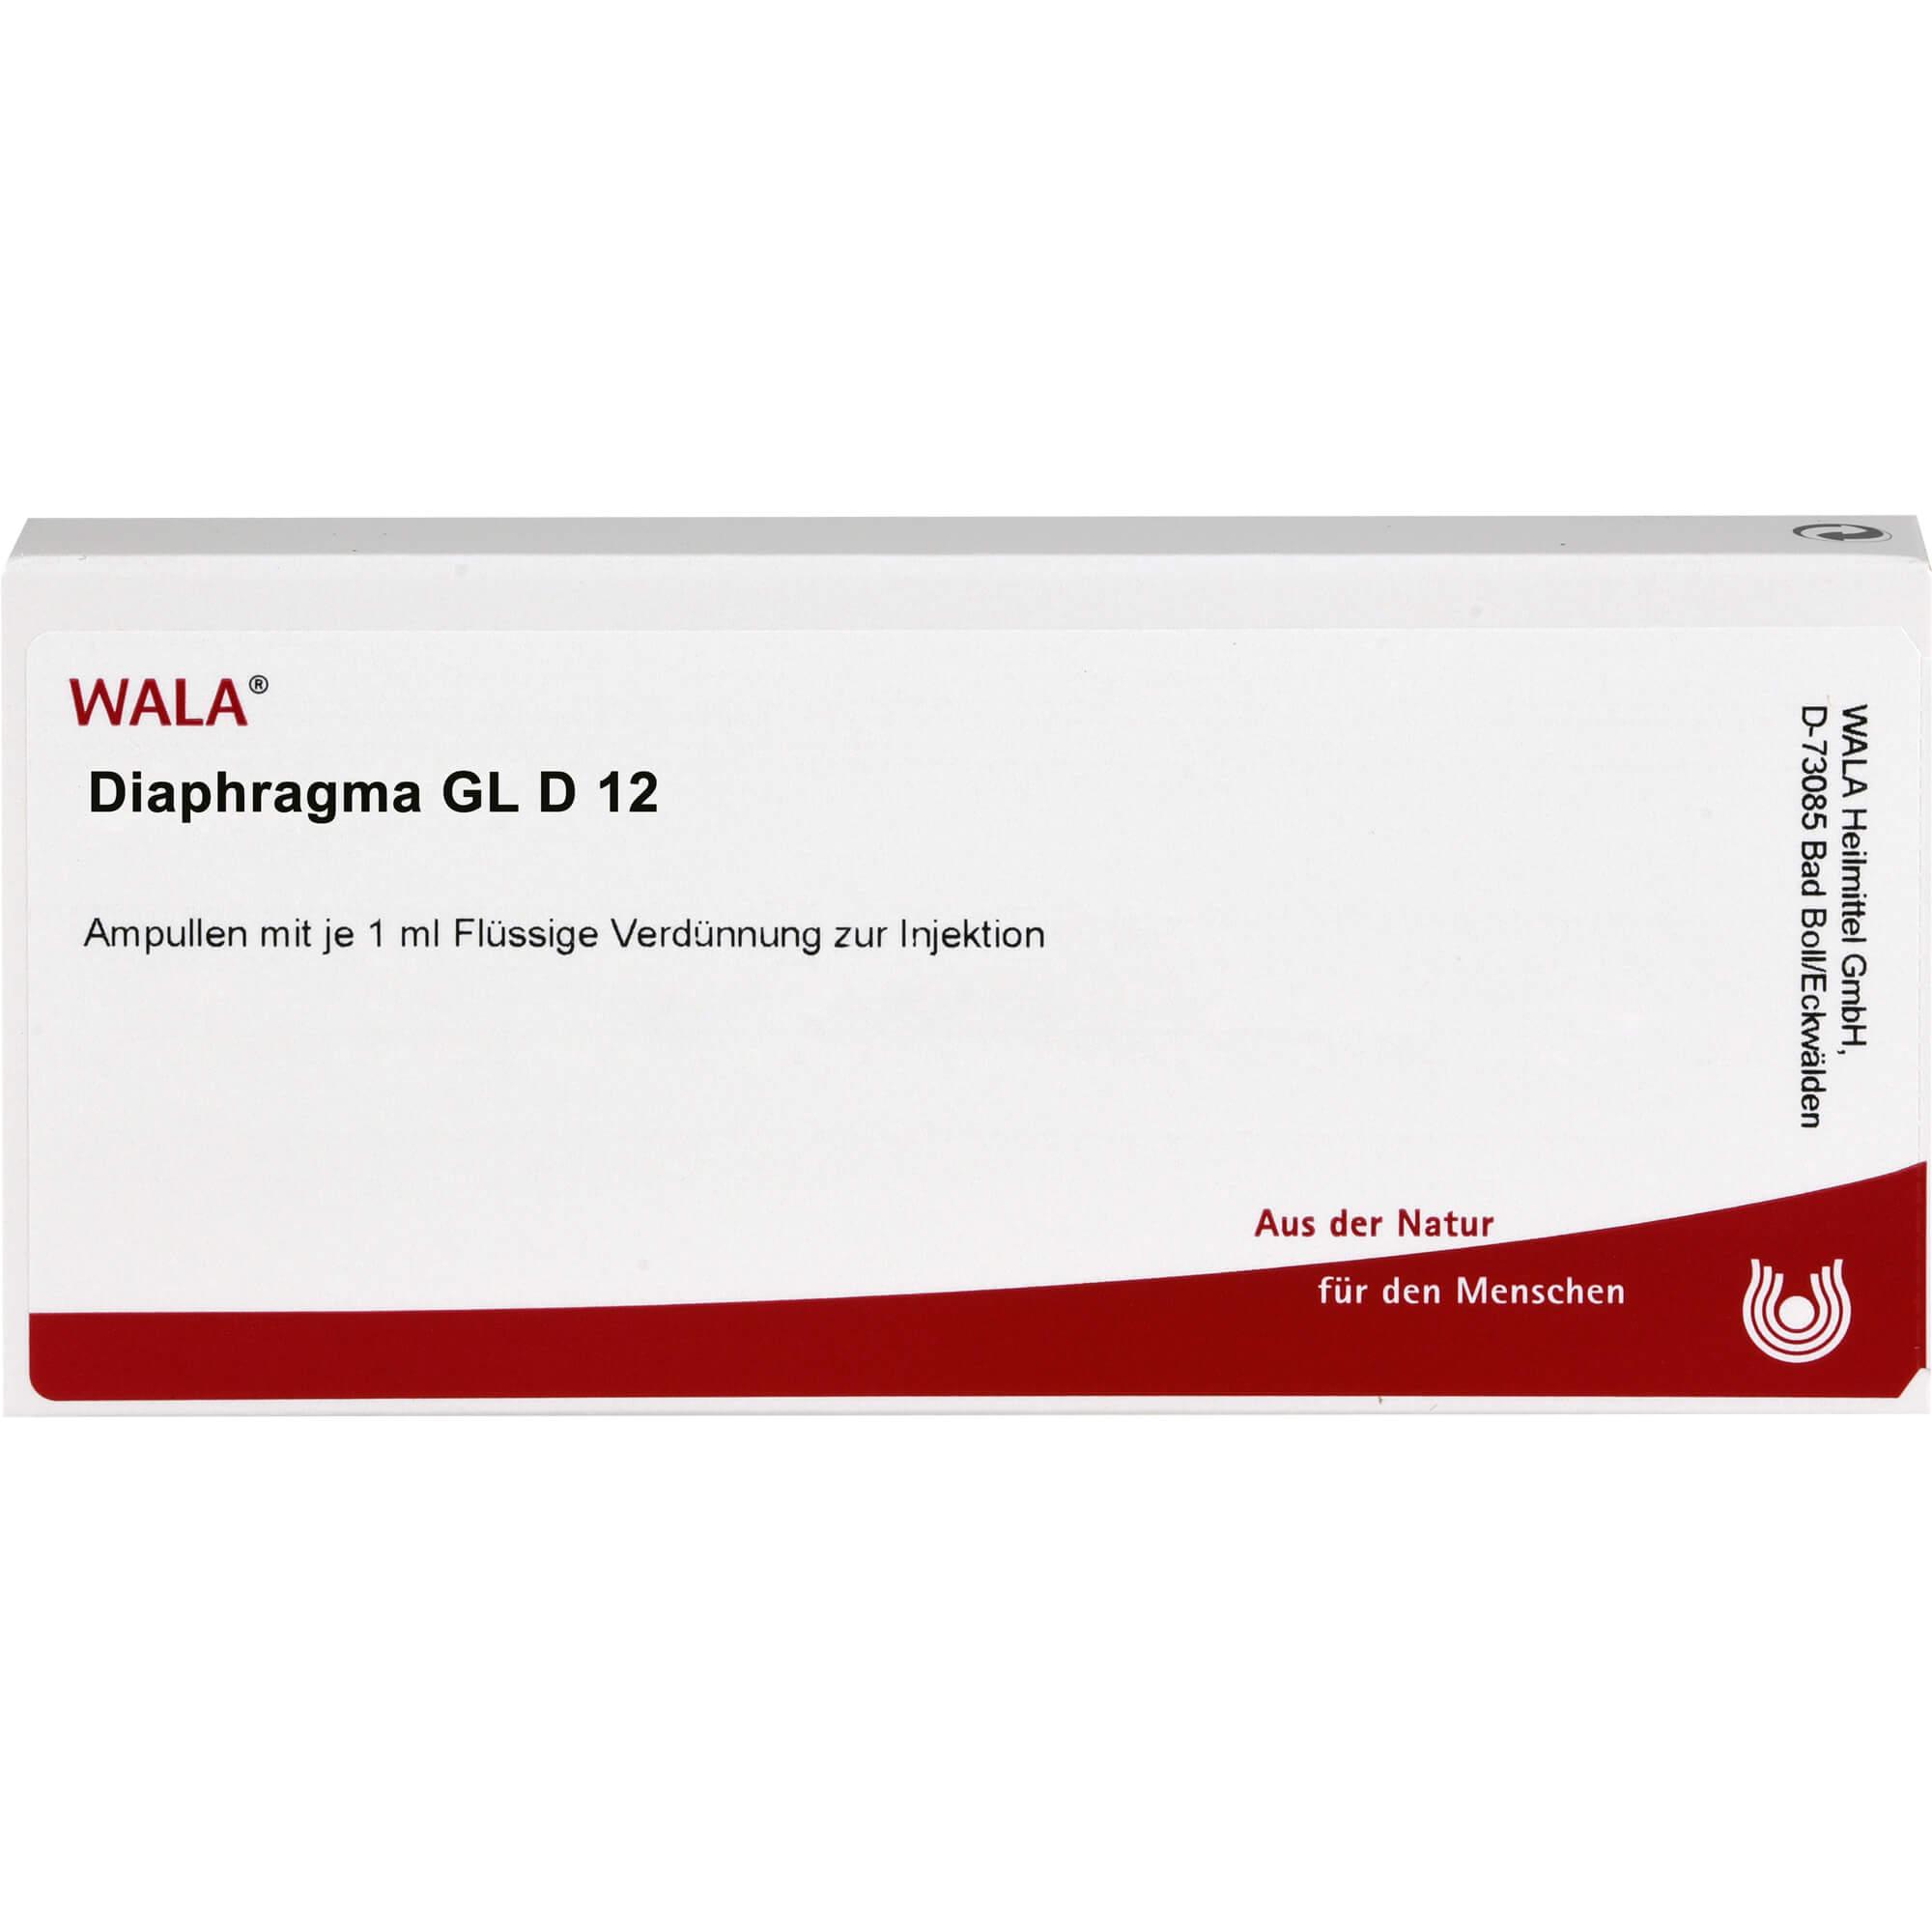 DIAPHRAGMA GL D 12 Ampullen